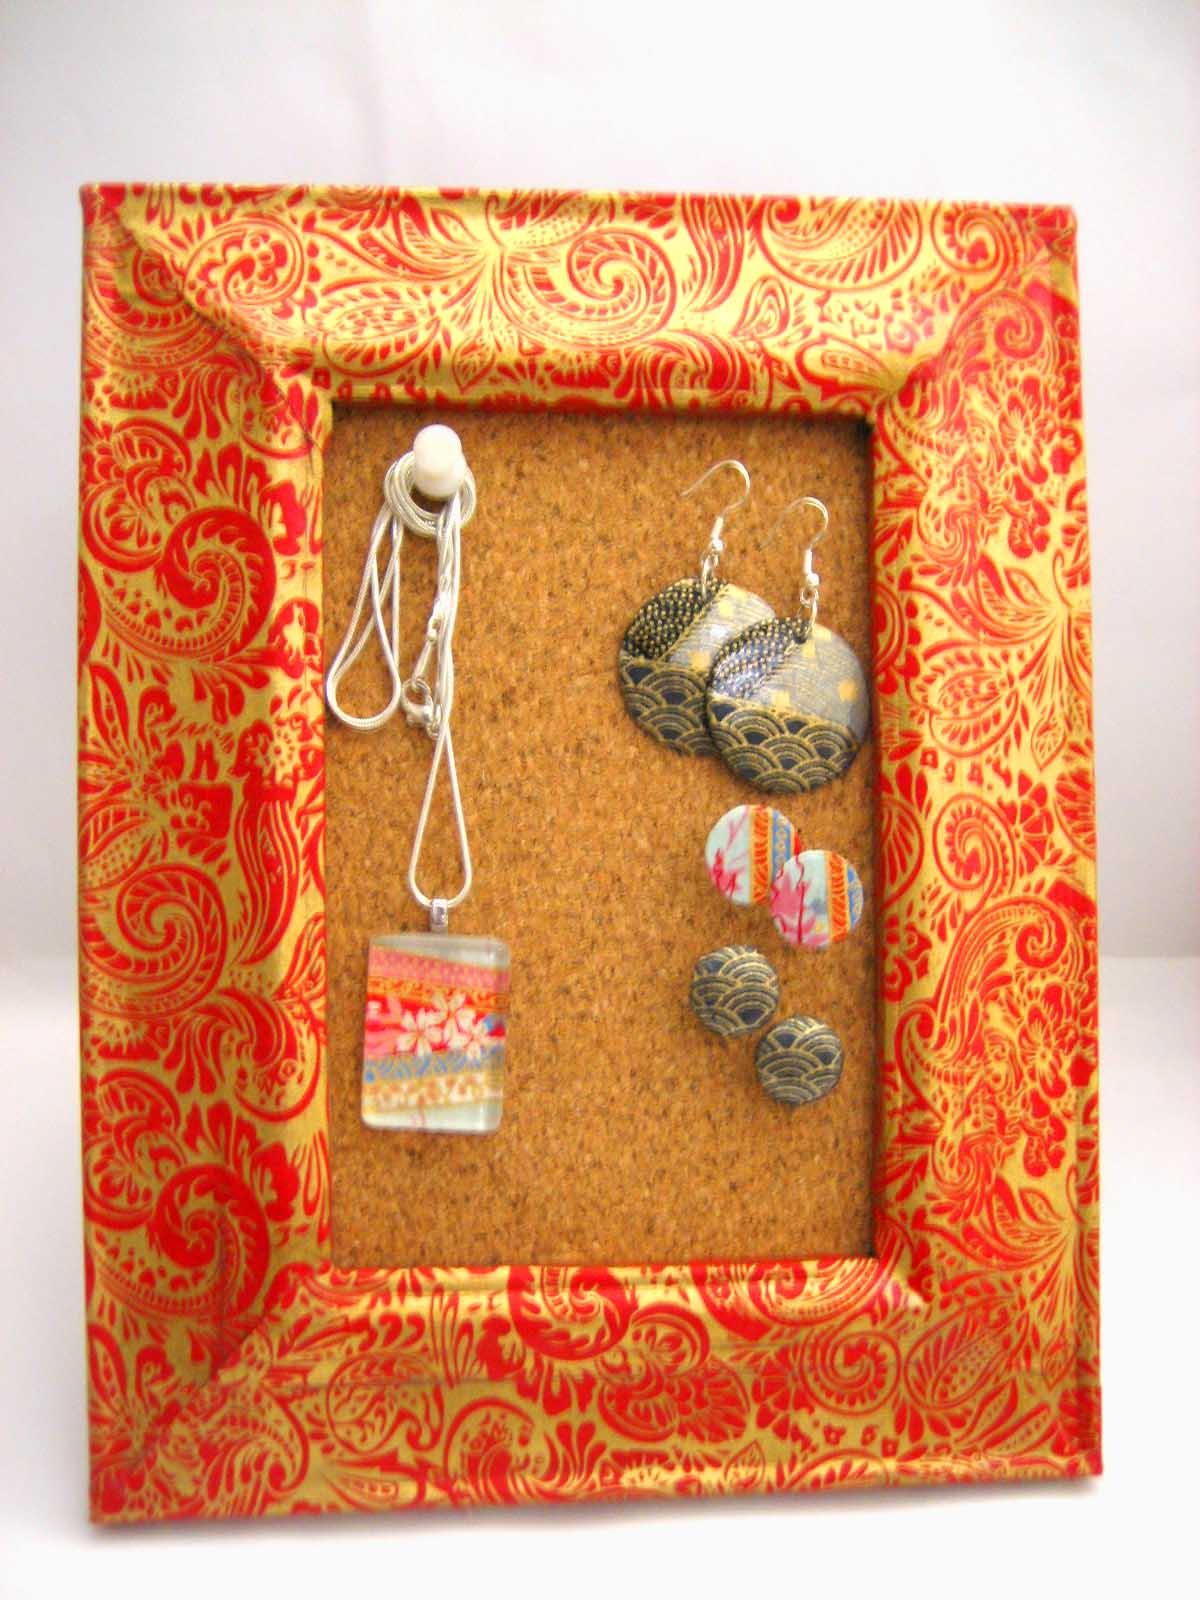 Glue + paper = jewellery? series part 5 - cork board decoupage frame ...